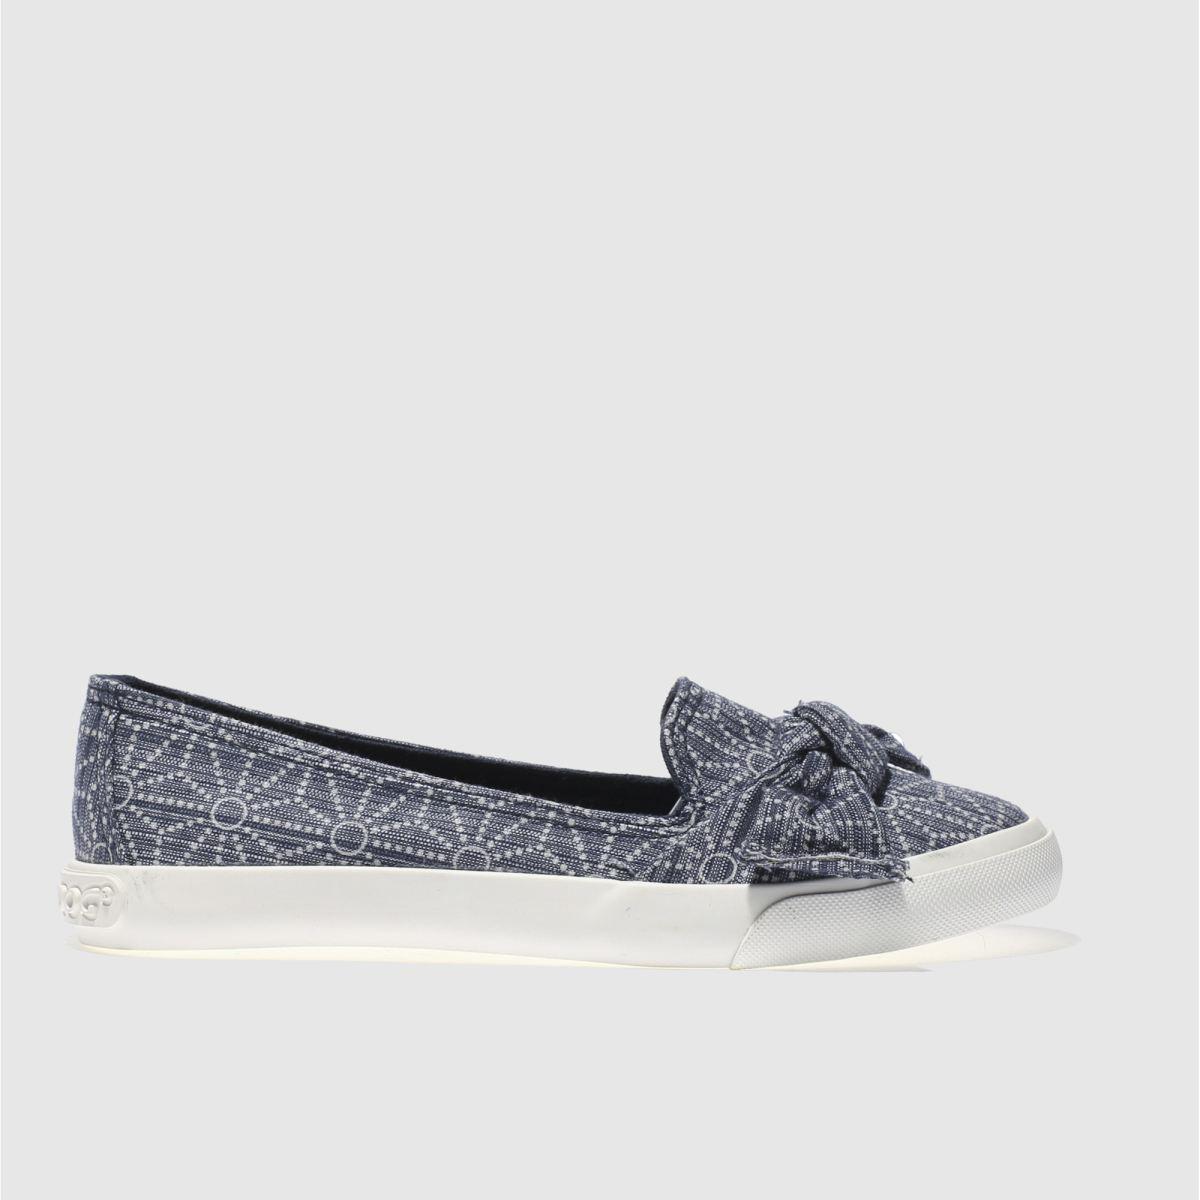 rocket dog navy & white clarita tizer flat shoes